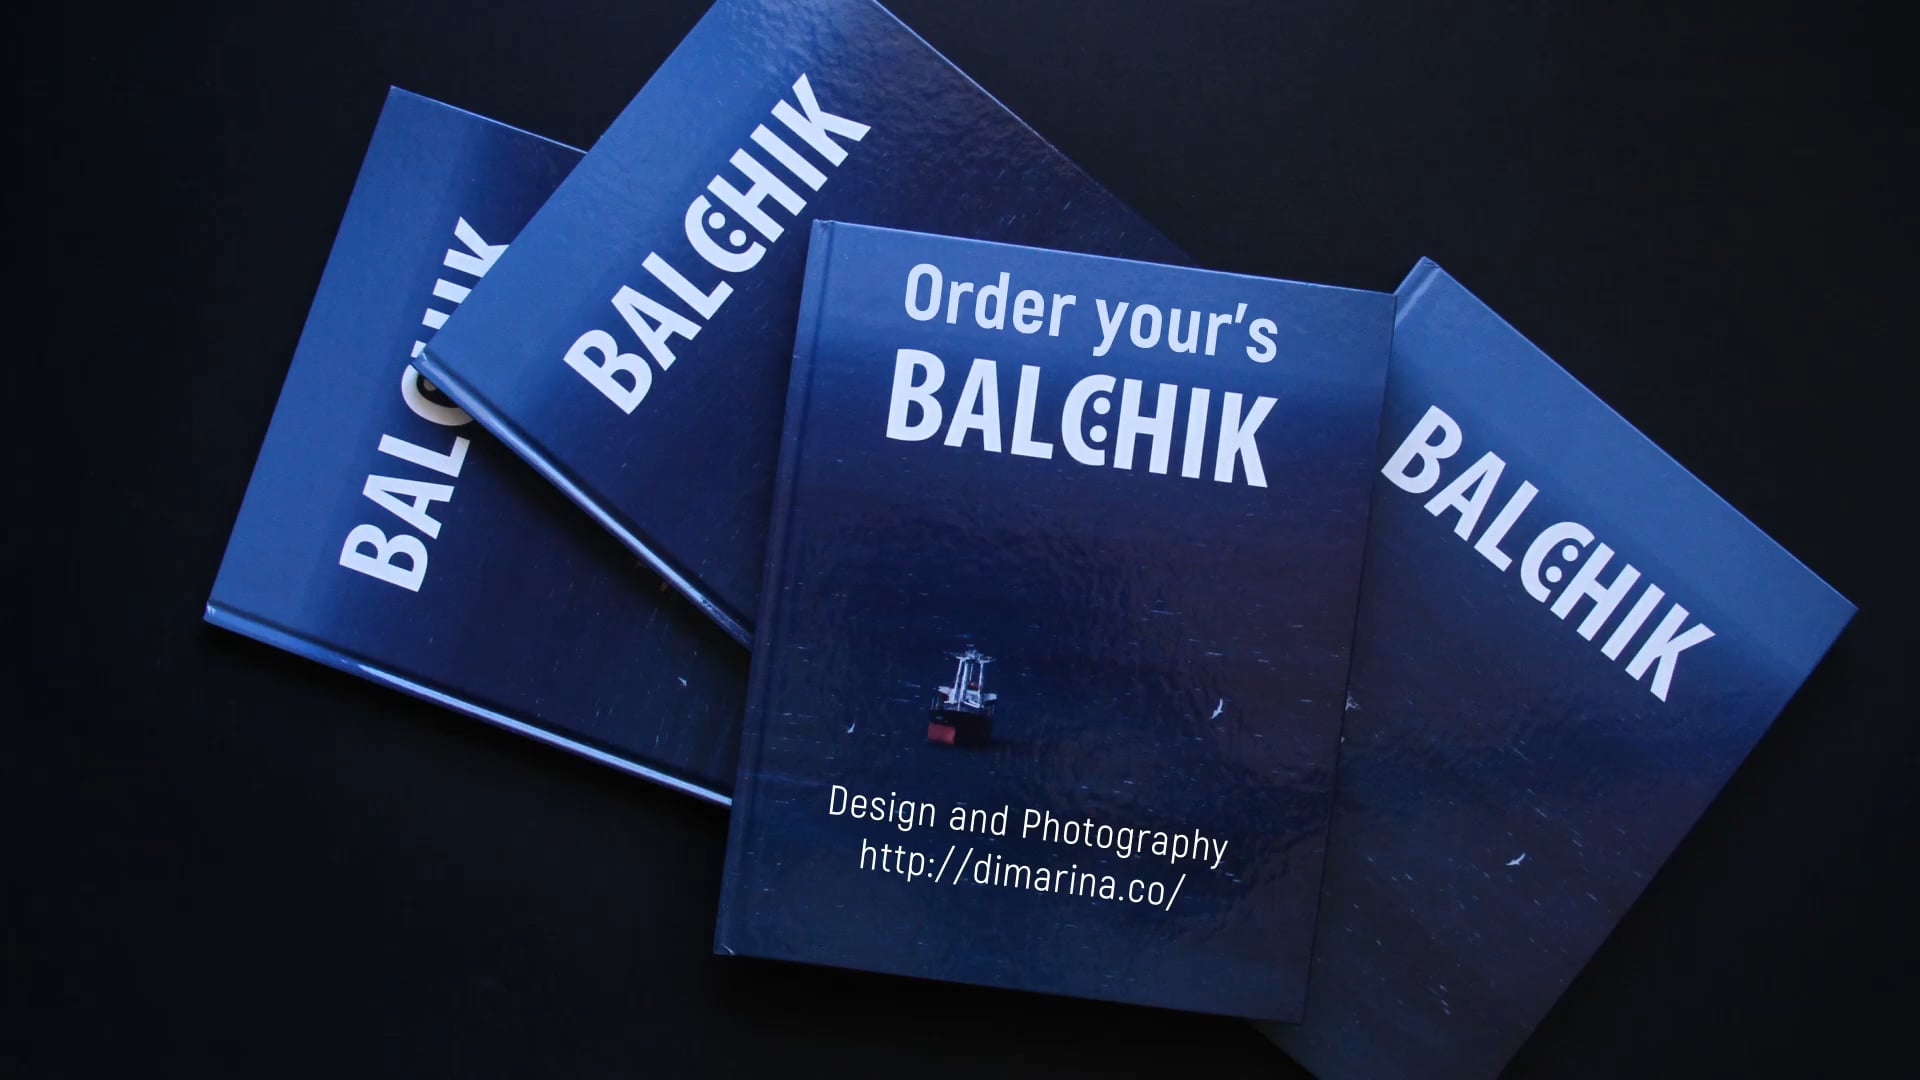 BalchikBookClip